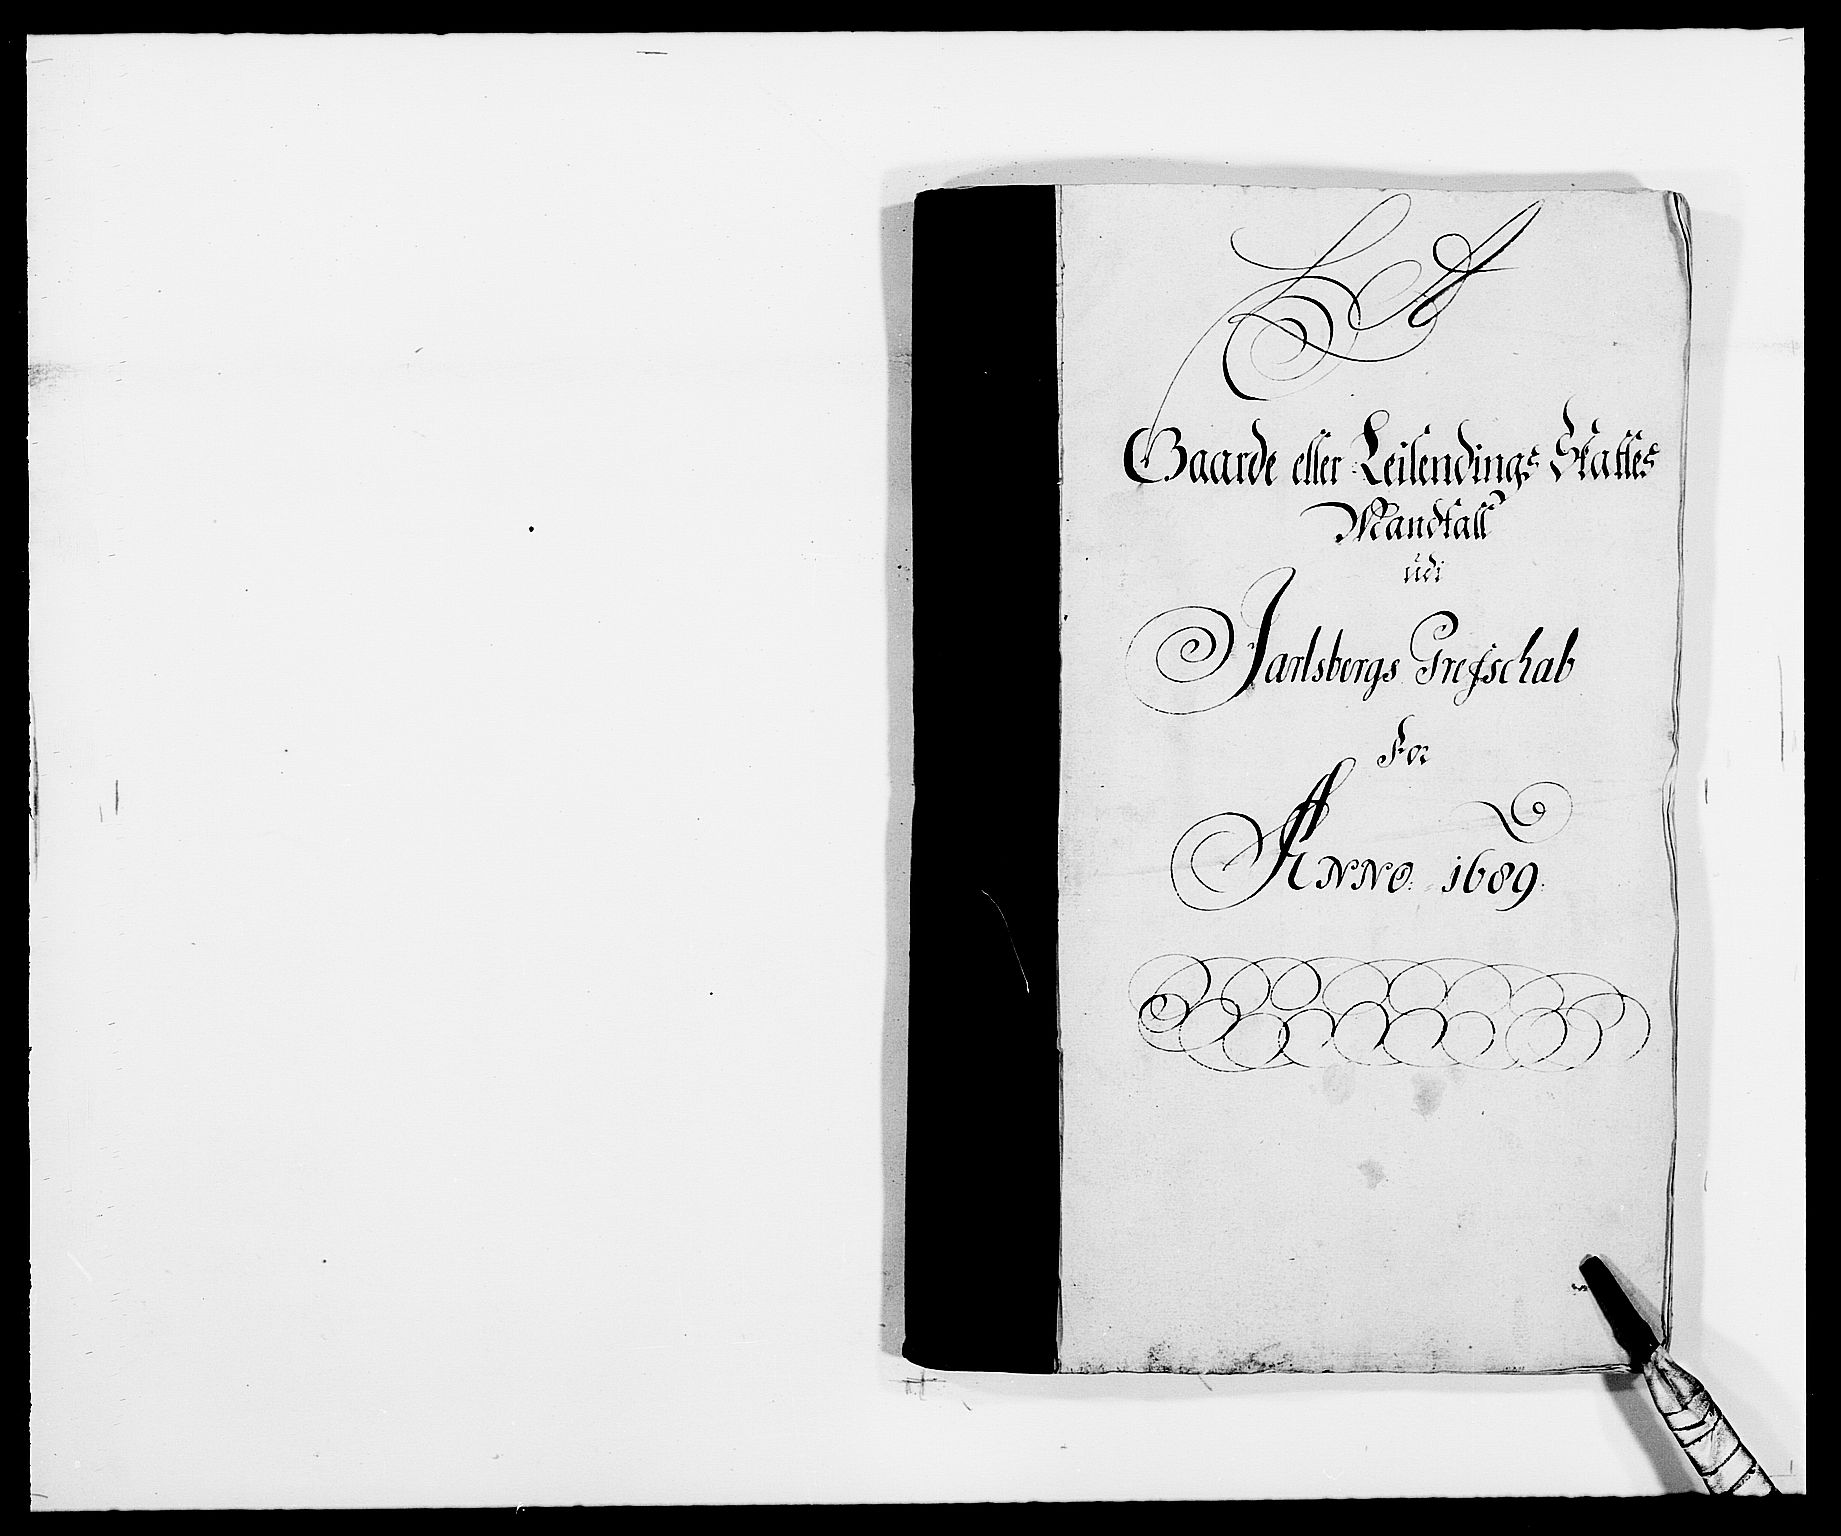 RA, Rentekammeret inntil 1814, Reviderte regnskaper, Fogderegnskap, R32/L1860: Fogderegnskap Jarlsberg grevskap, 1686-1690, s. 1